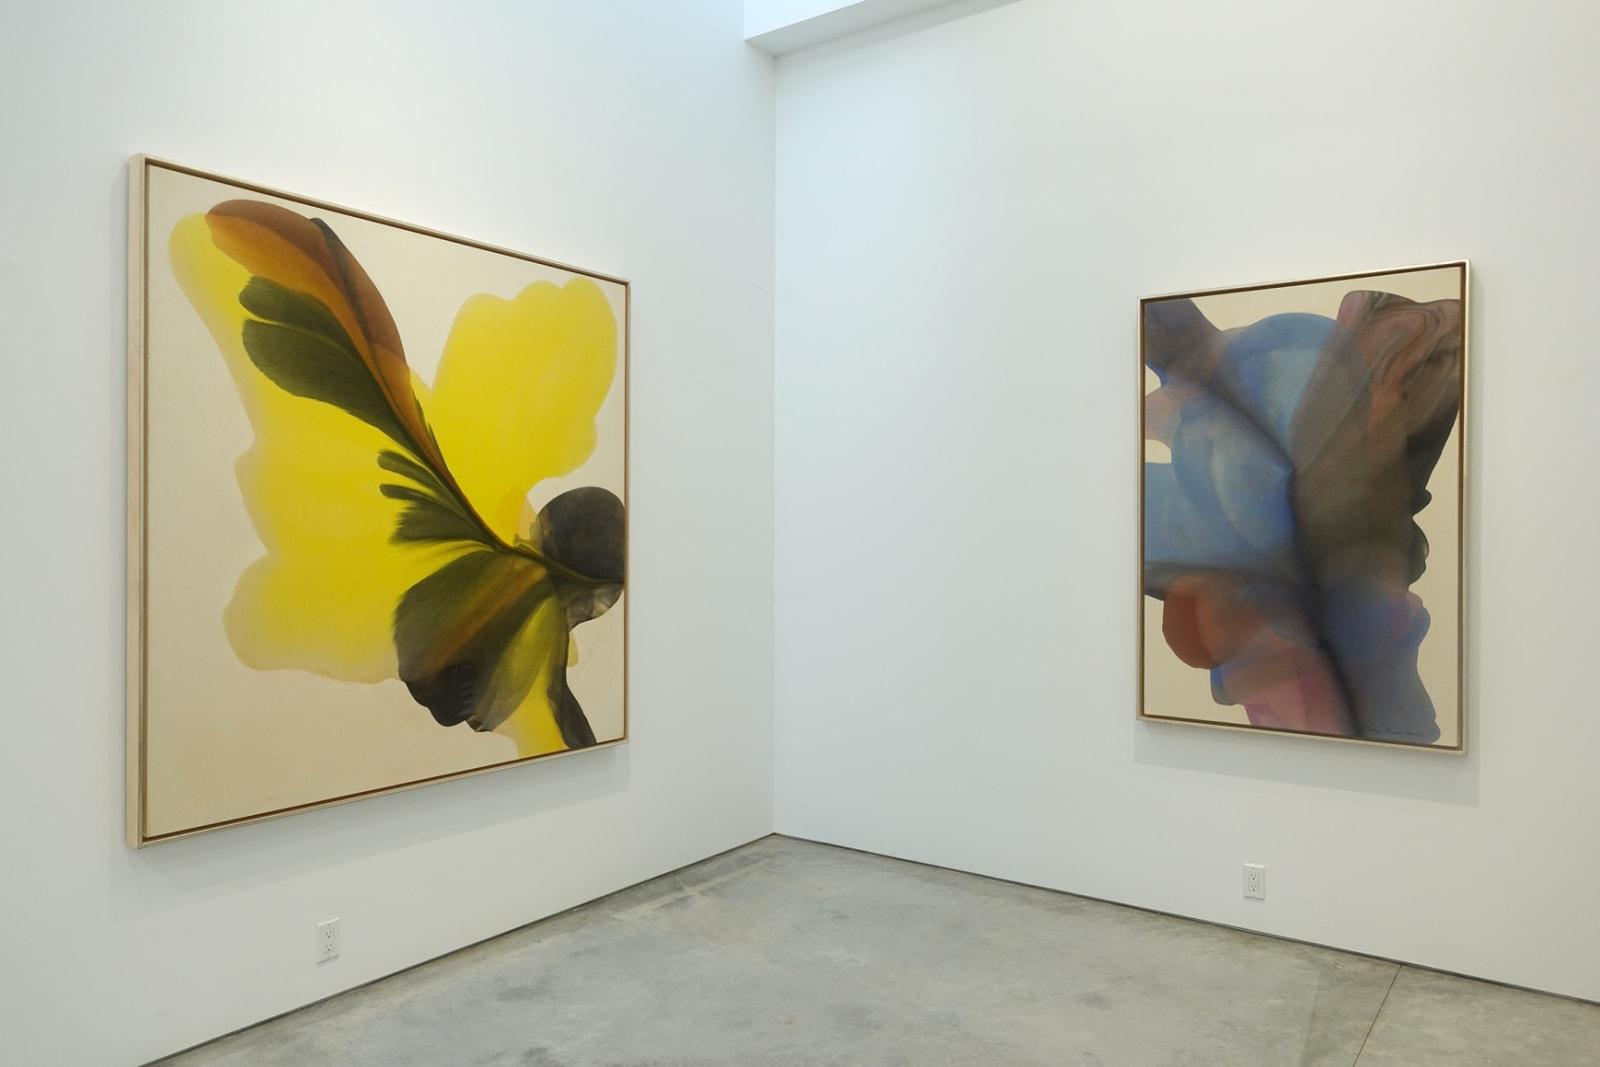 Installation view: Irene Monat Stern: Air of Twilight